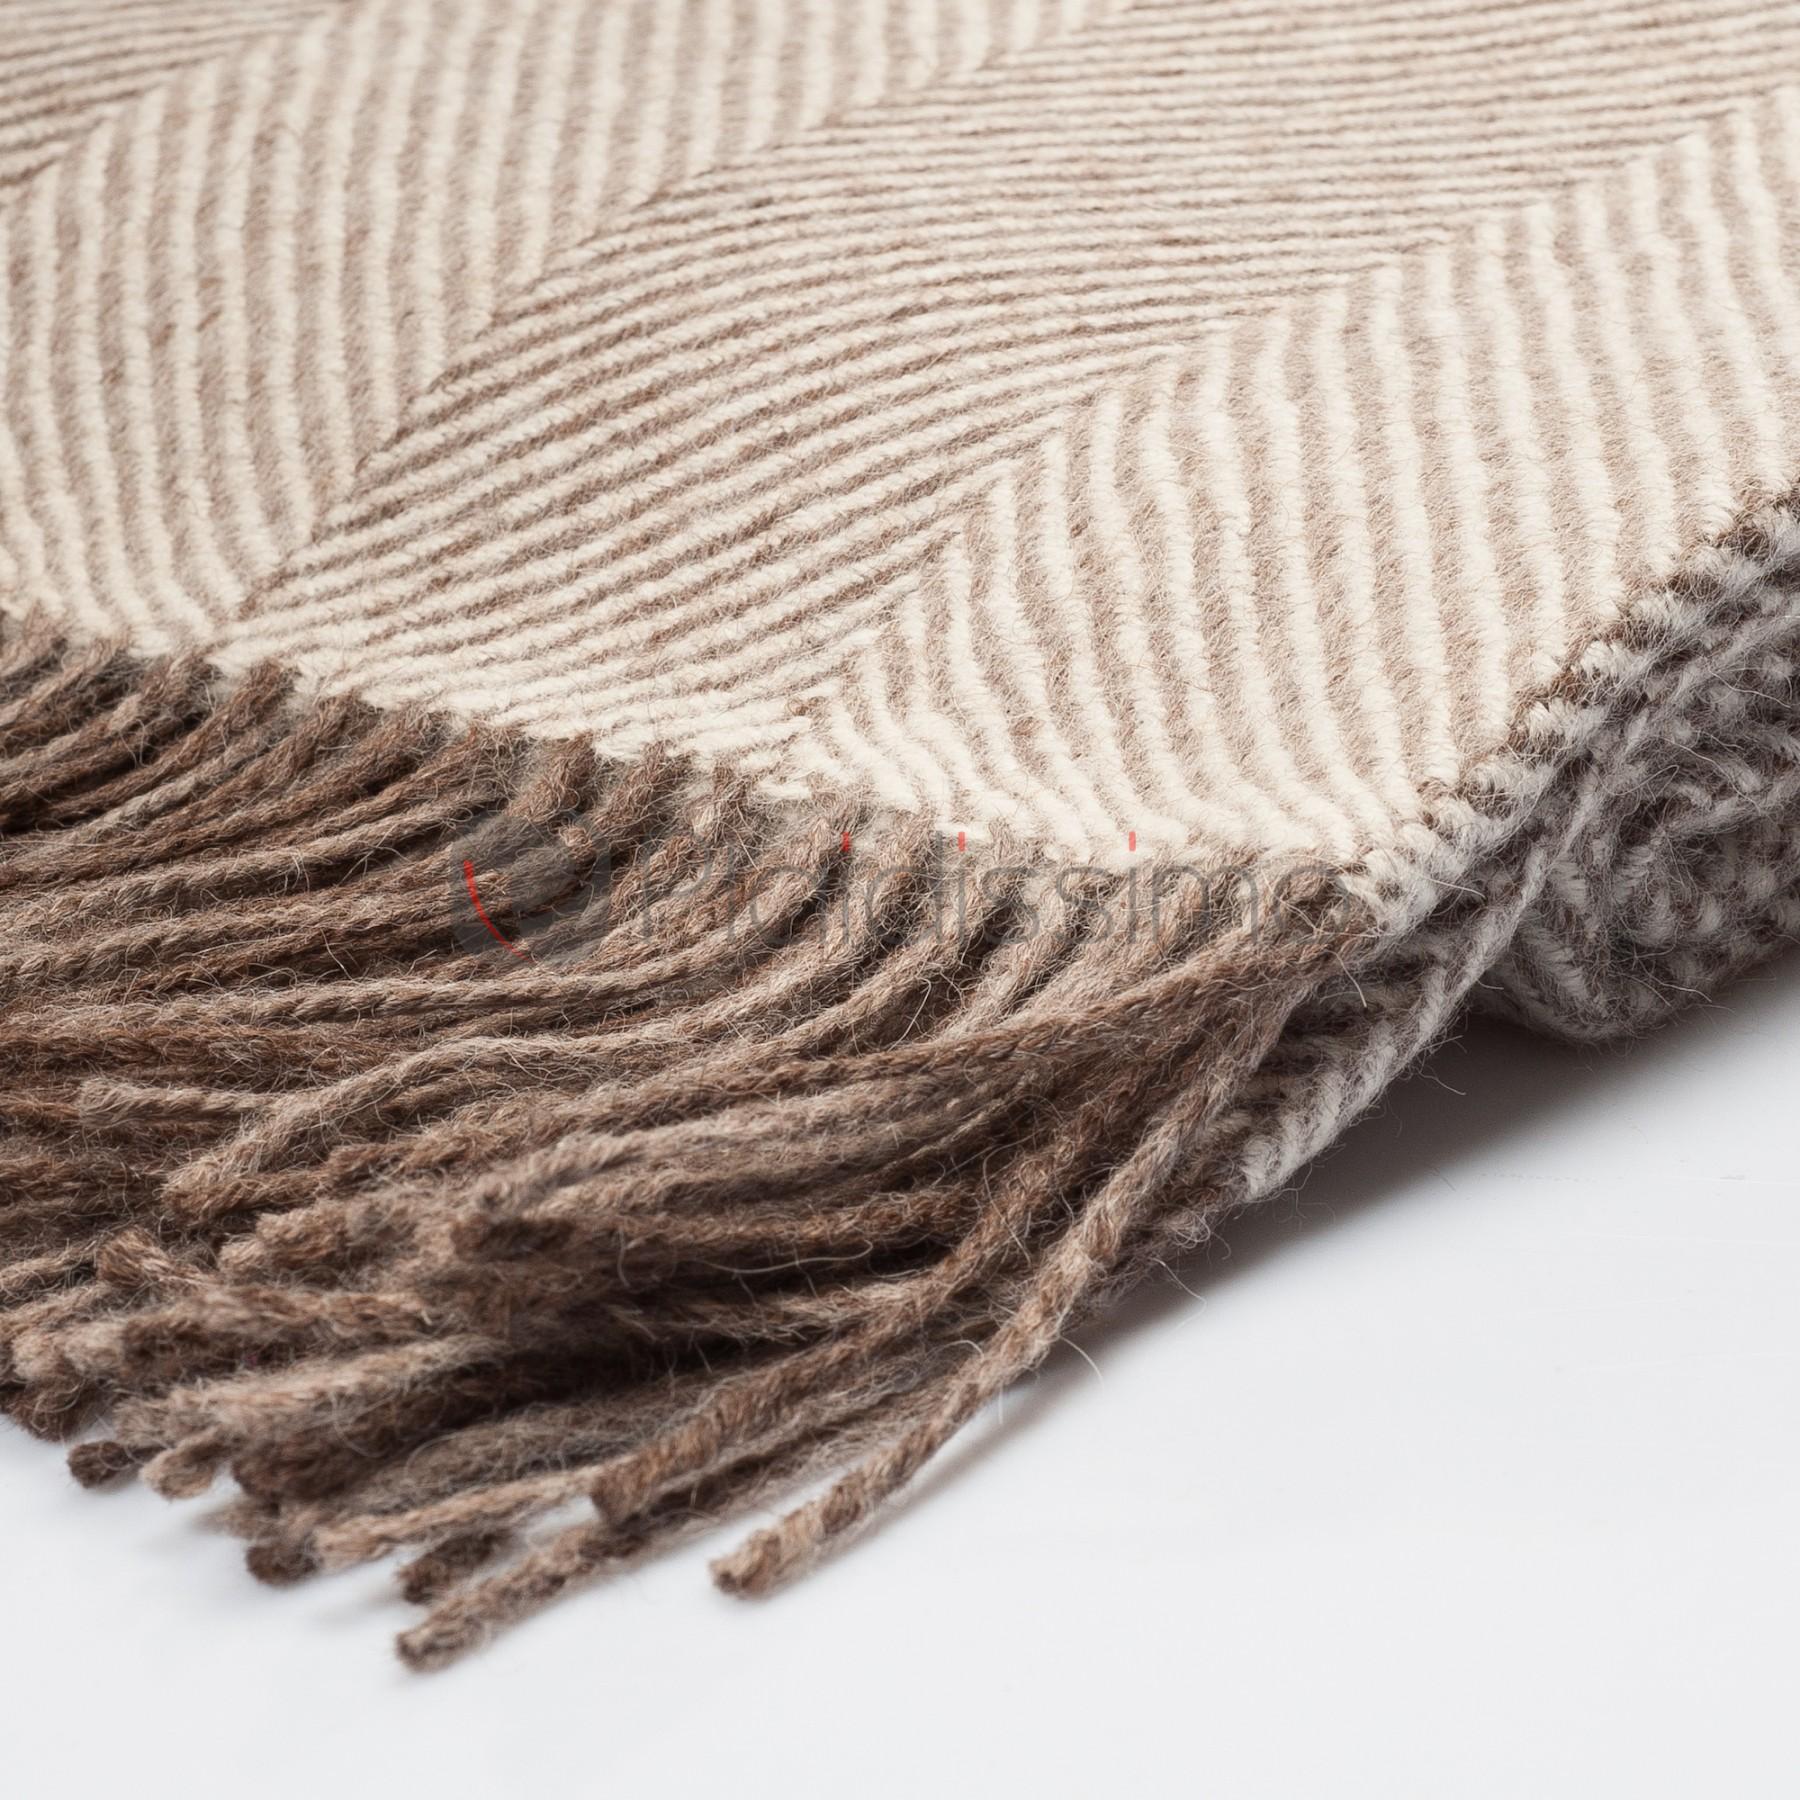 plaid alpaga laine plaid en alpaga laine tricot motif de tresses beige fonc plaid laine alpaga. Black Bedroom Furniture Sets. Home Design Ideas